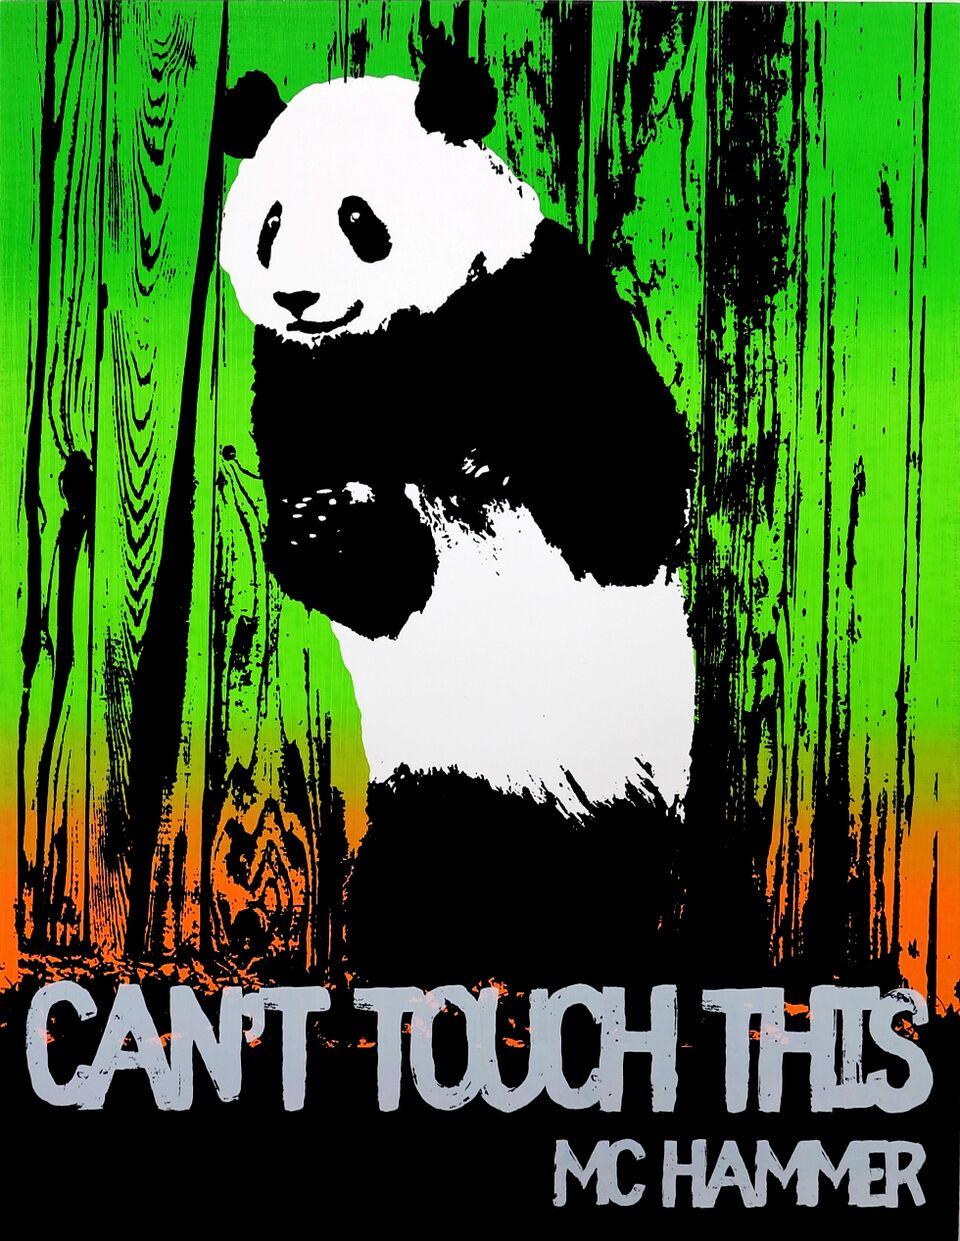 Motivational Panda (MC Hammer)